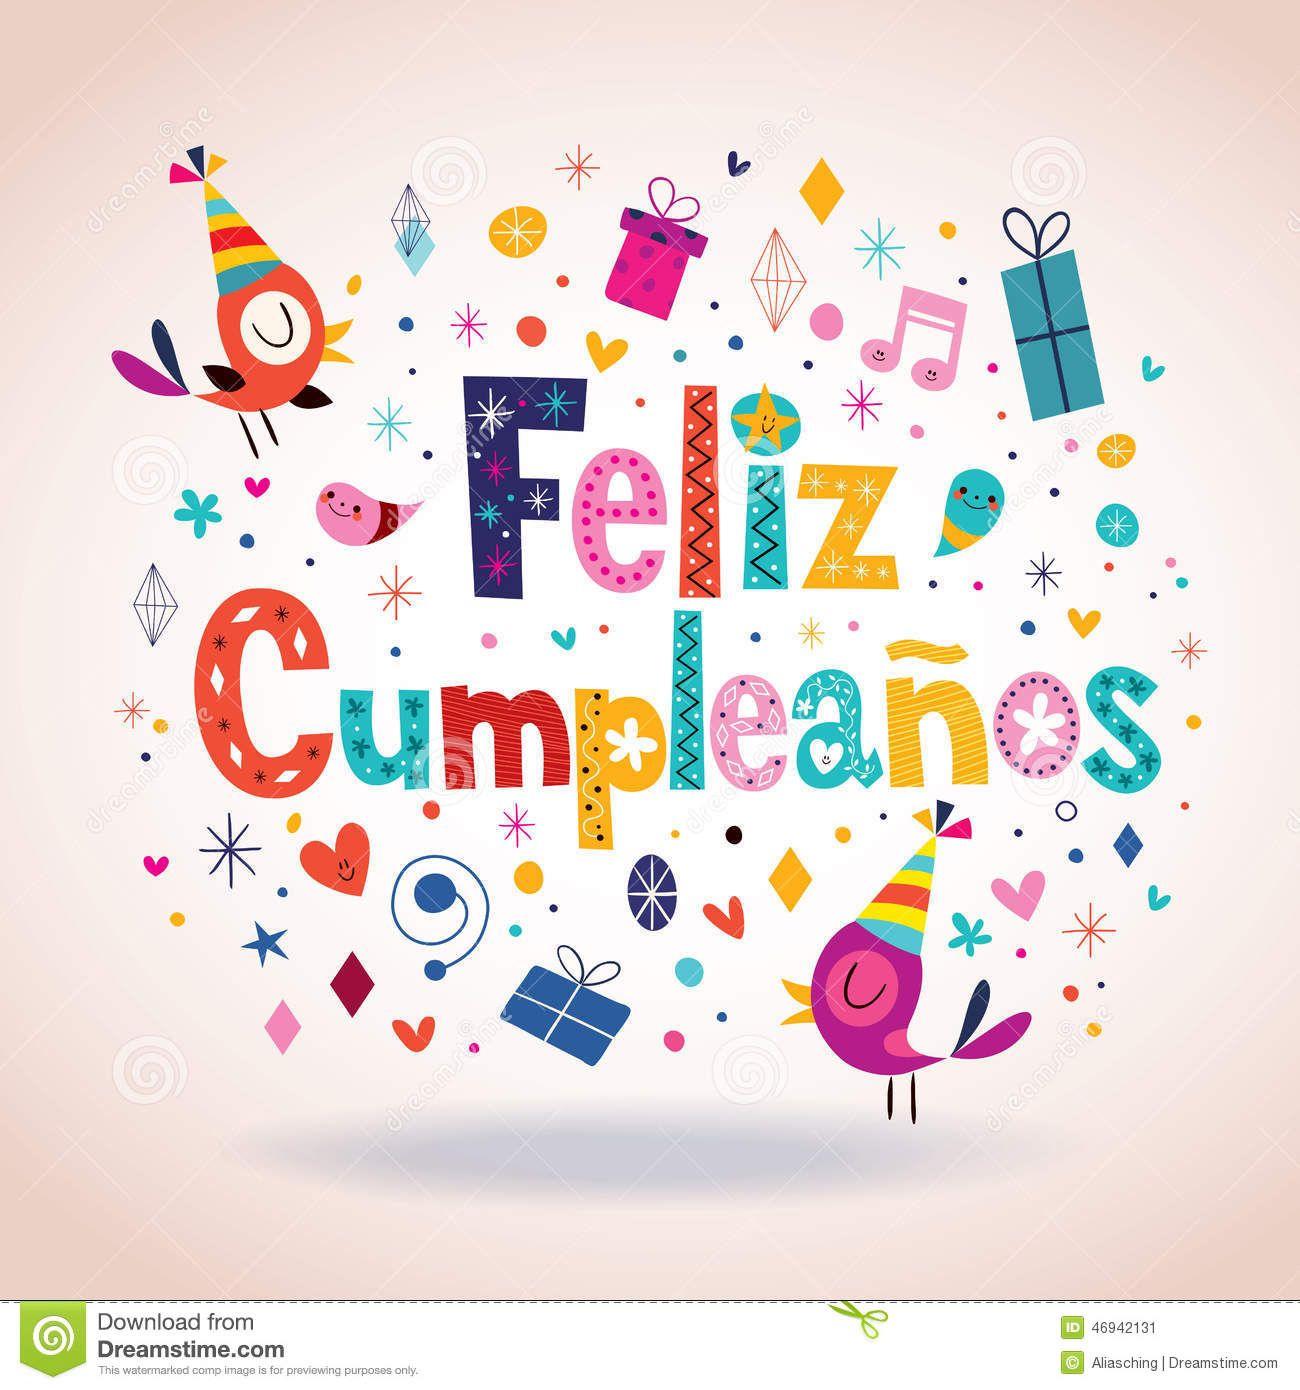 Feliz Cumpleanos - Happy Birthday In Spanish Card - Download From - Free Printable Happy Birthday Cards In Spanish